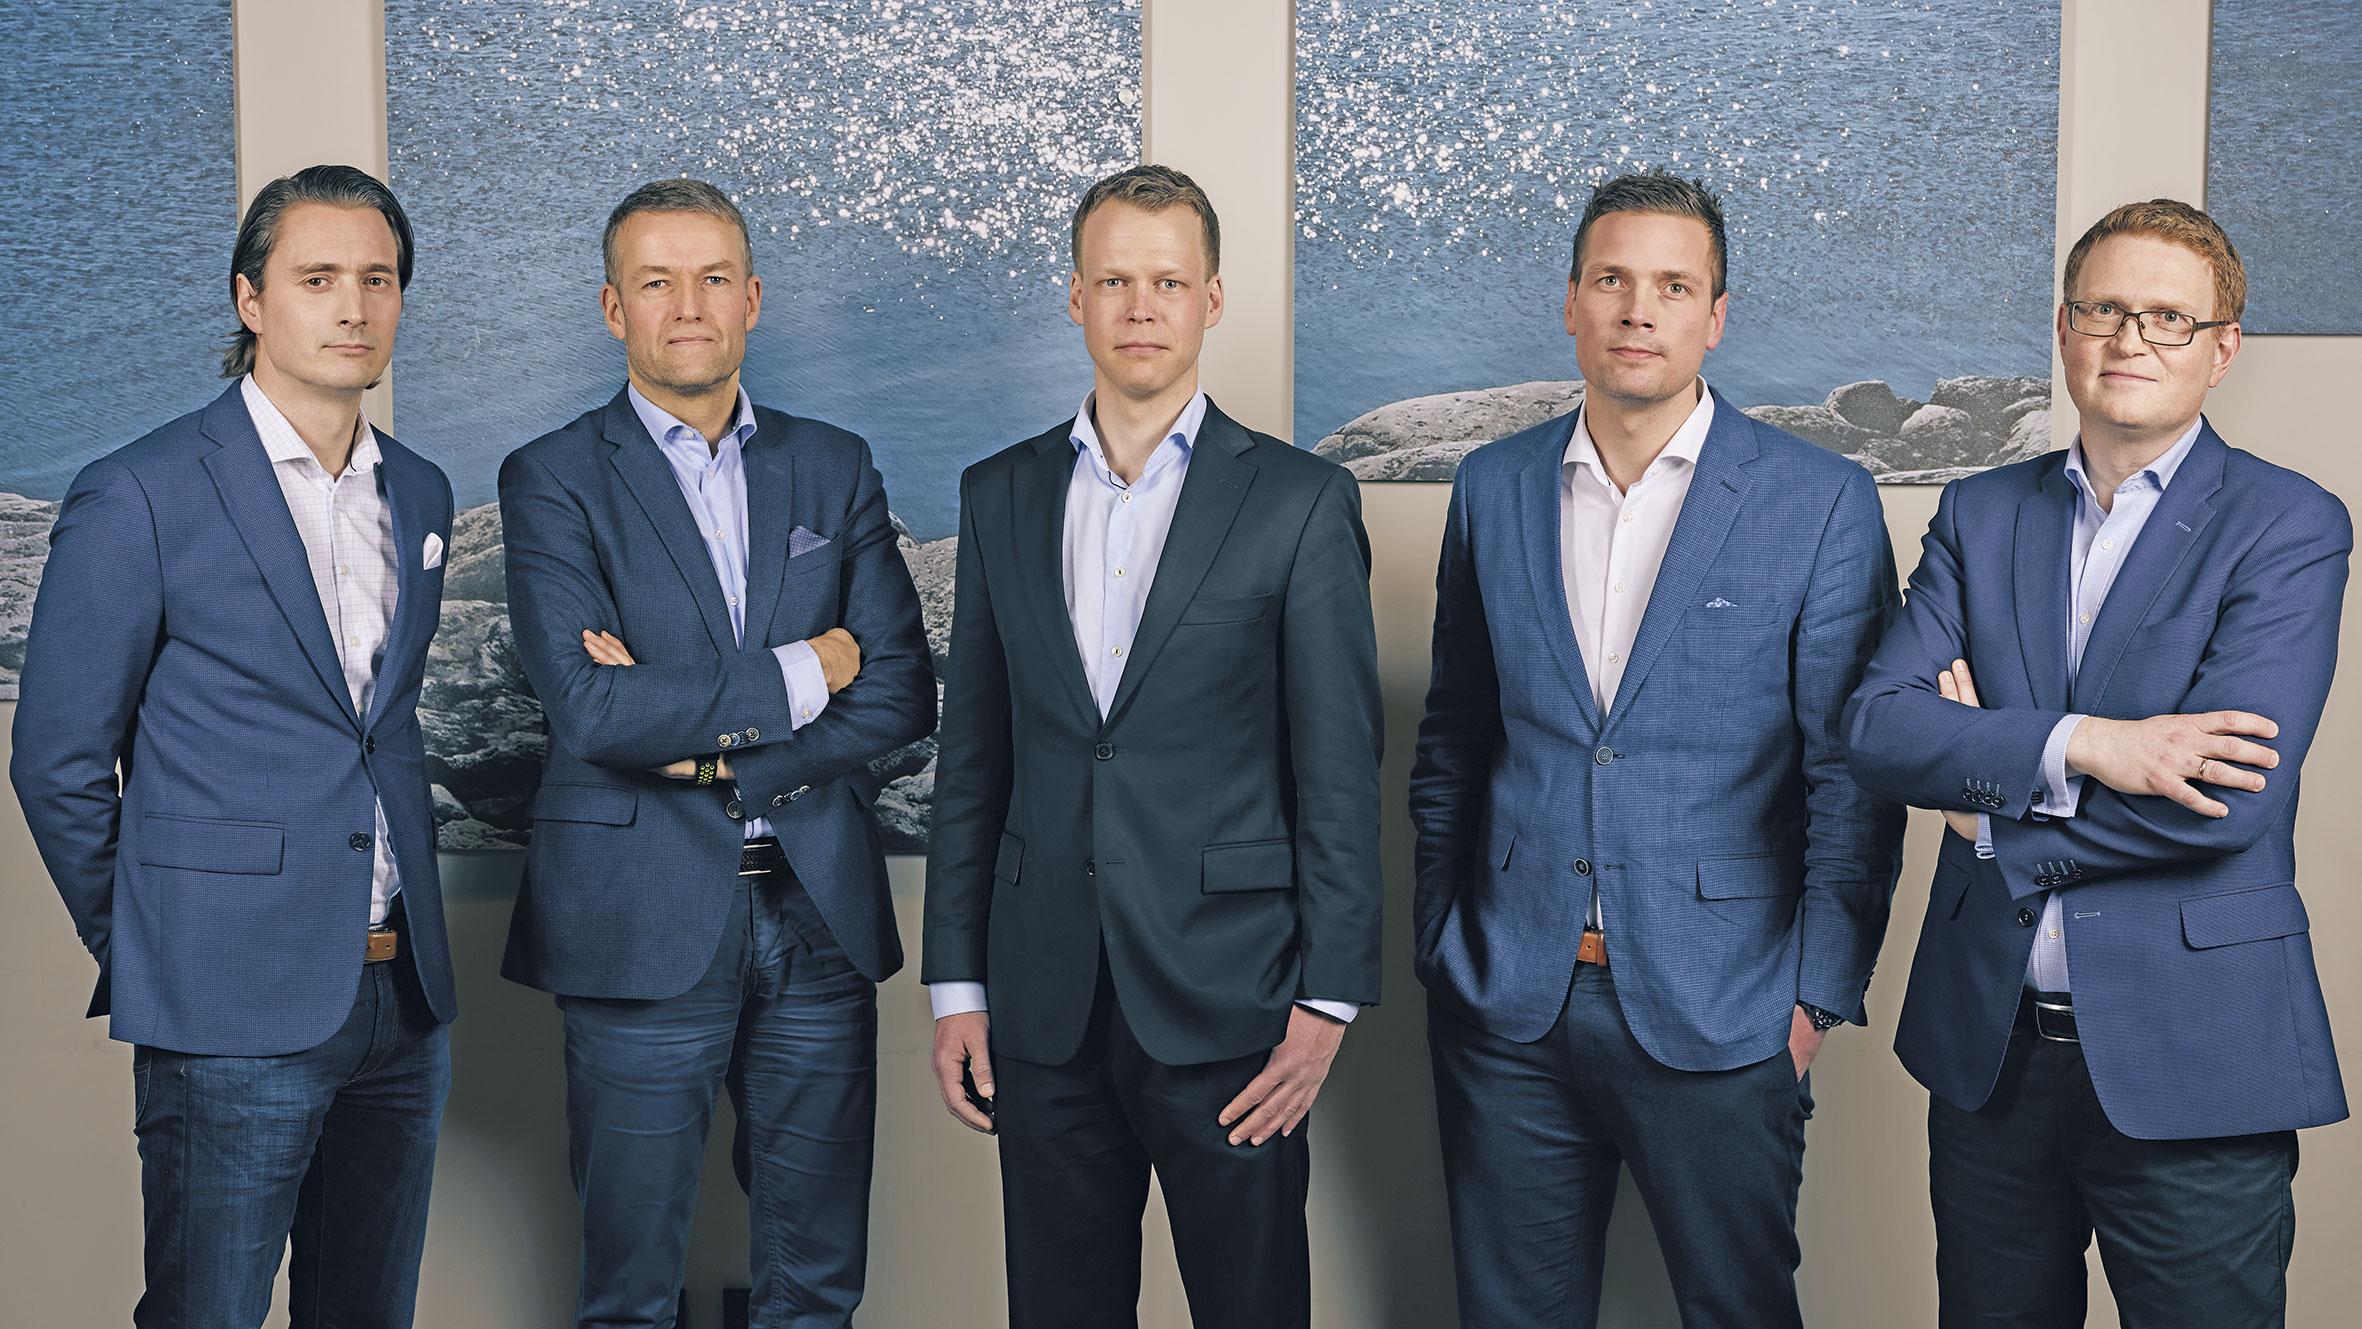 Investeringsteamet i Broodstock Capital. Fra venstre Håkon Aglen Fredriksen, Pål Kristian Moe, Roar Øverås, Martin Stræte Resell og Jan Erik Løvik. Foto: Broodstock